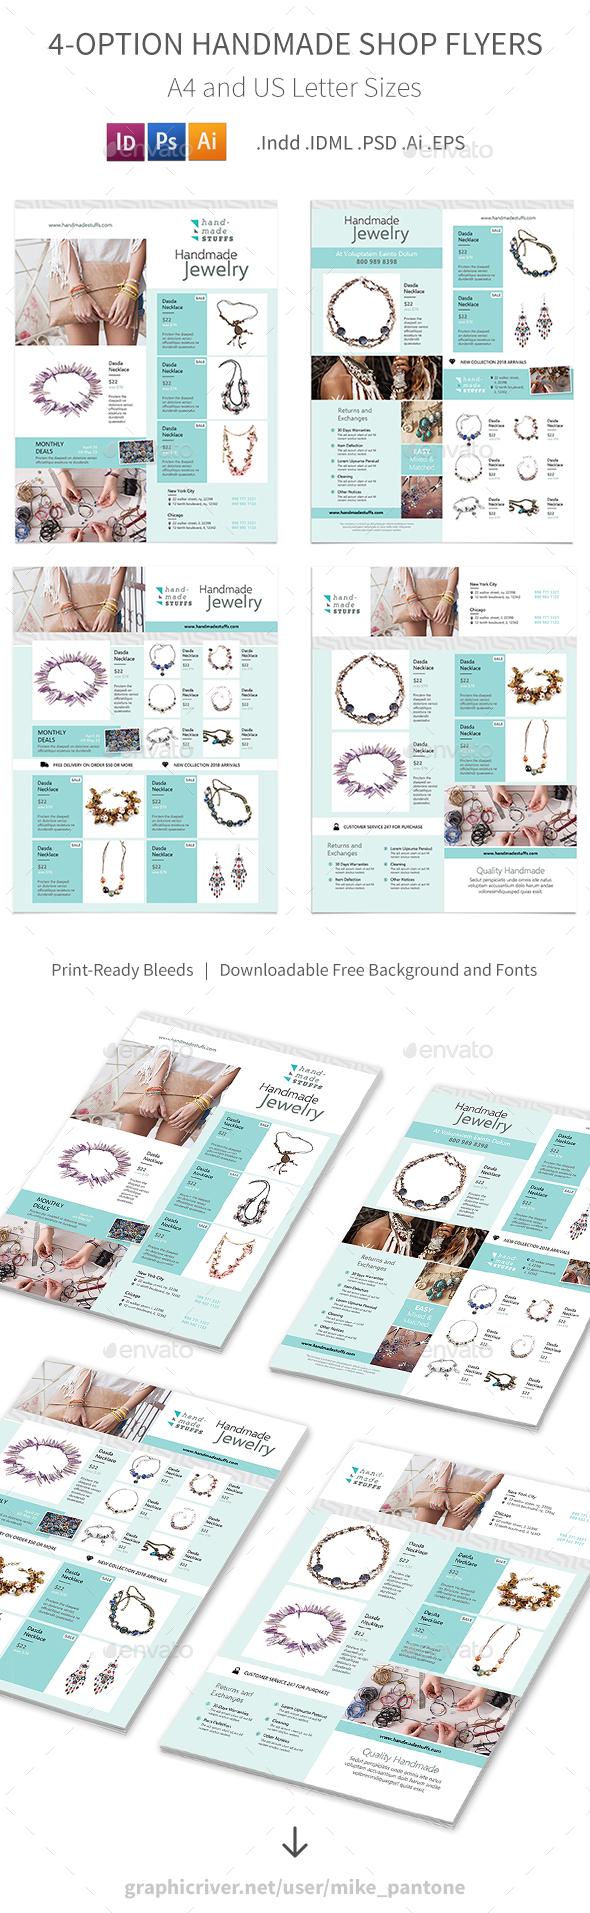 Handmade Shop Flyers – 4 Options - Commerce Flyers